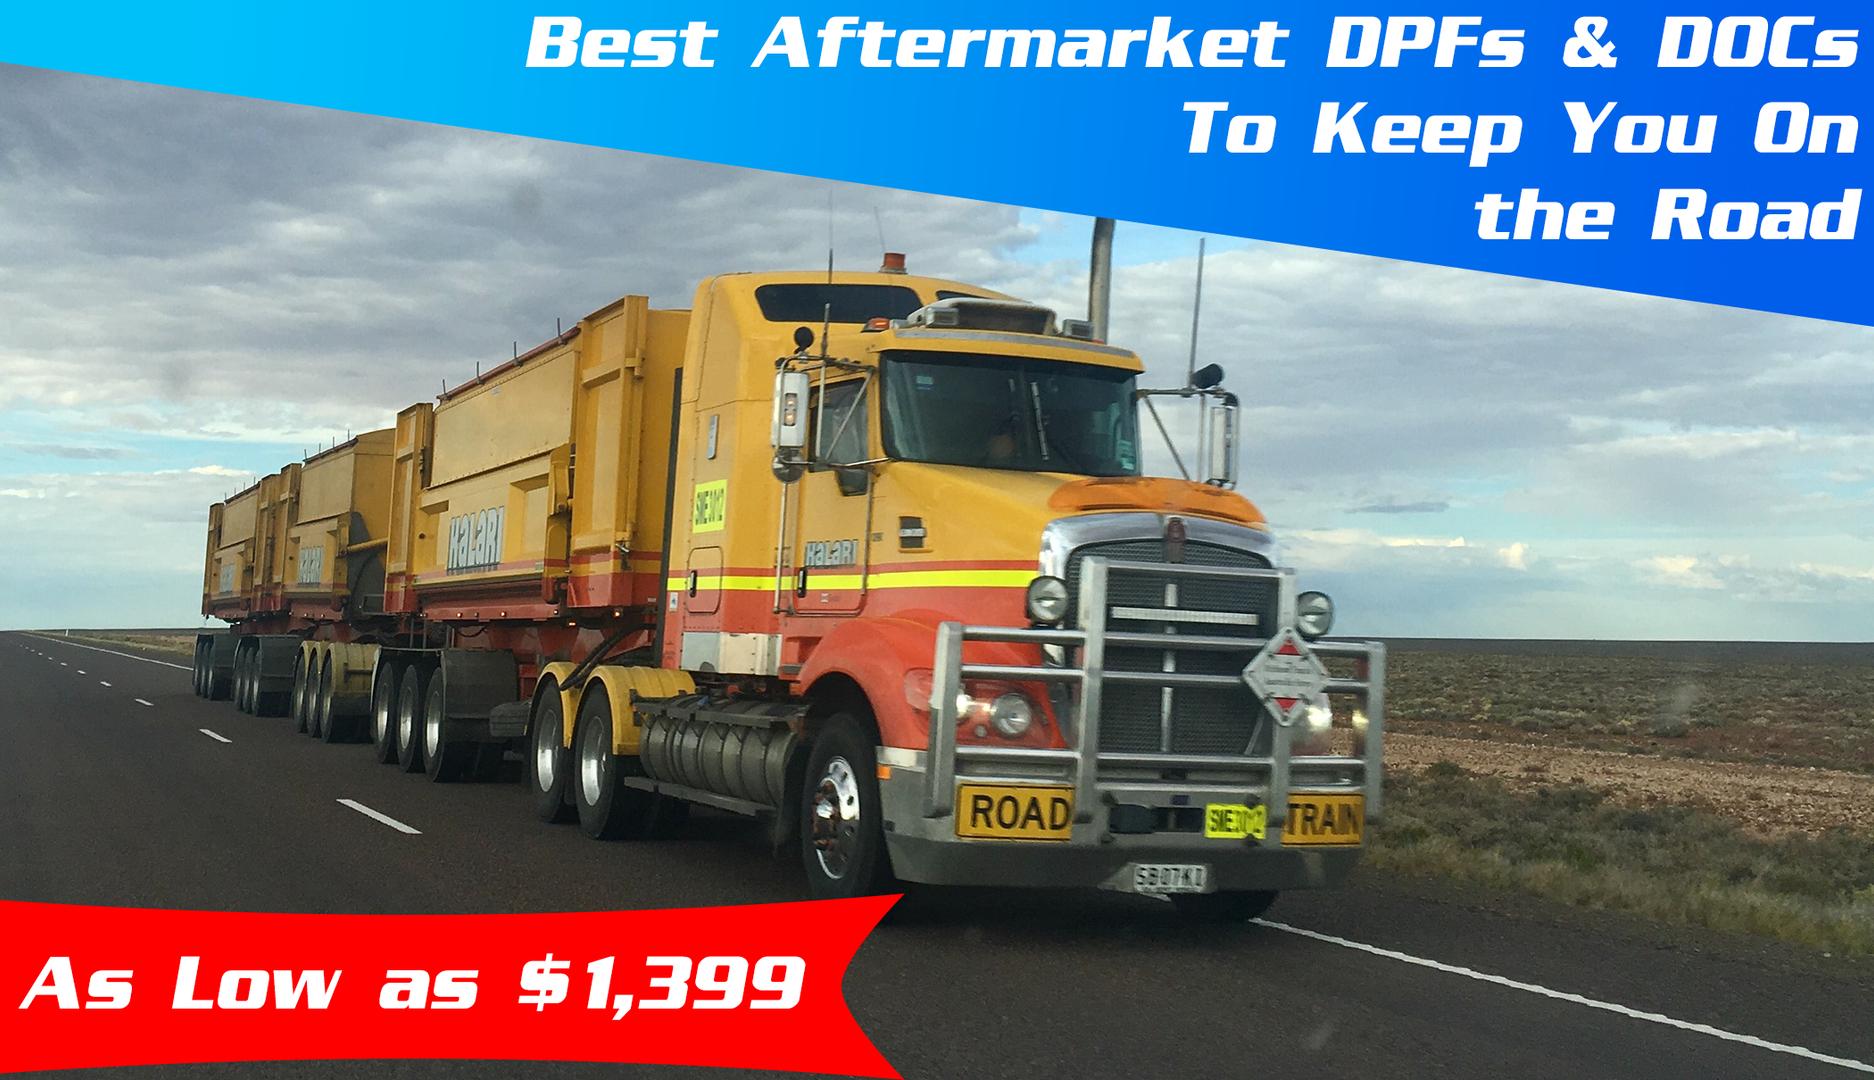 Aftermarket-DPF-Banner-Mobile-1.png